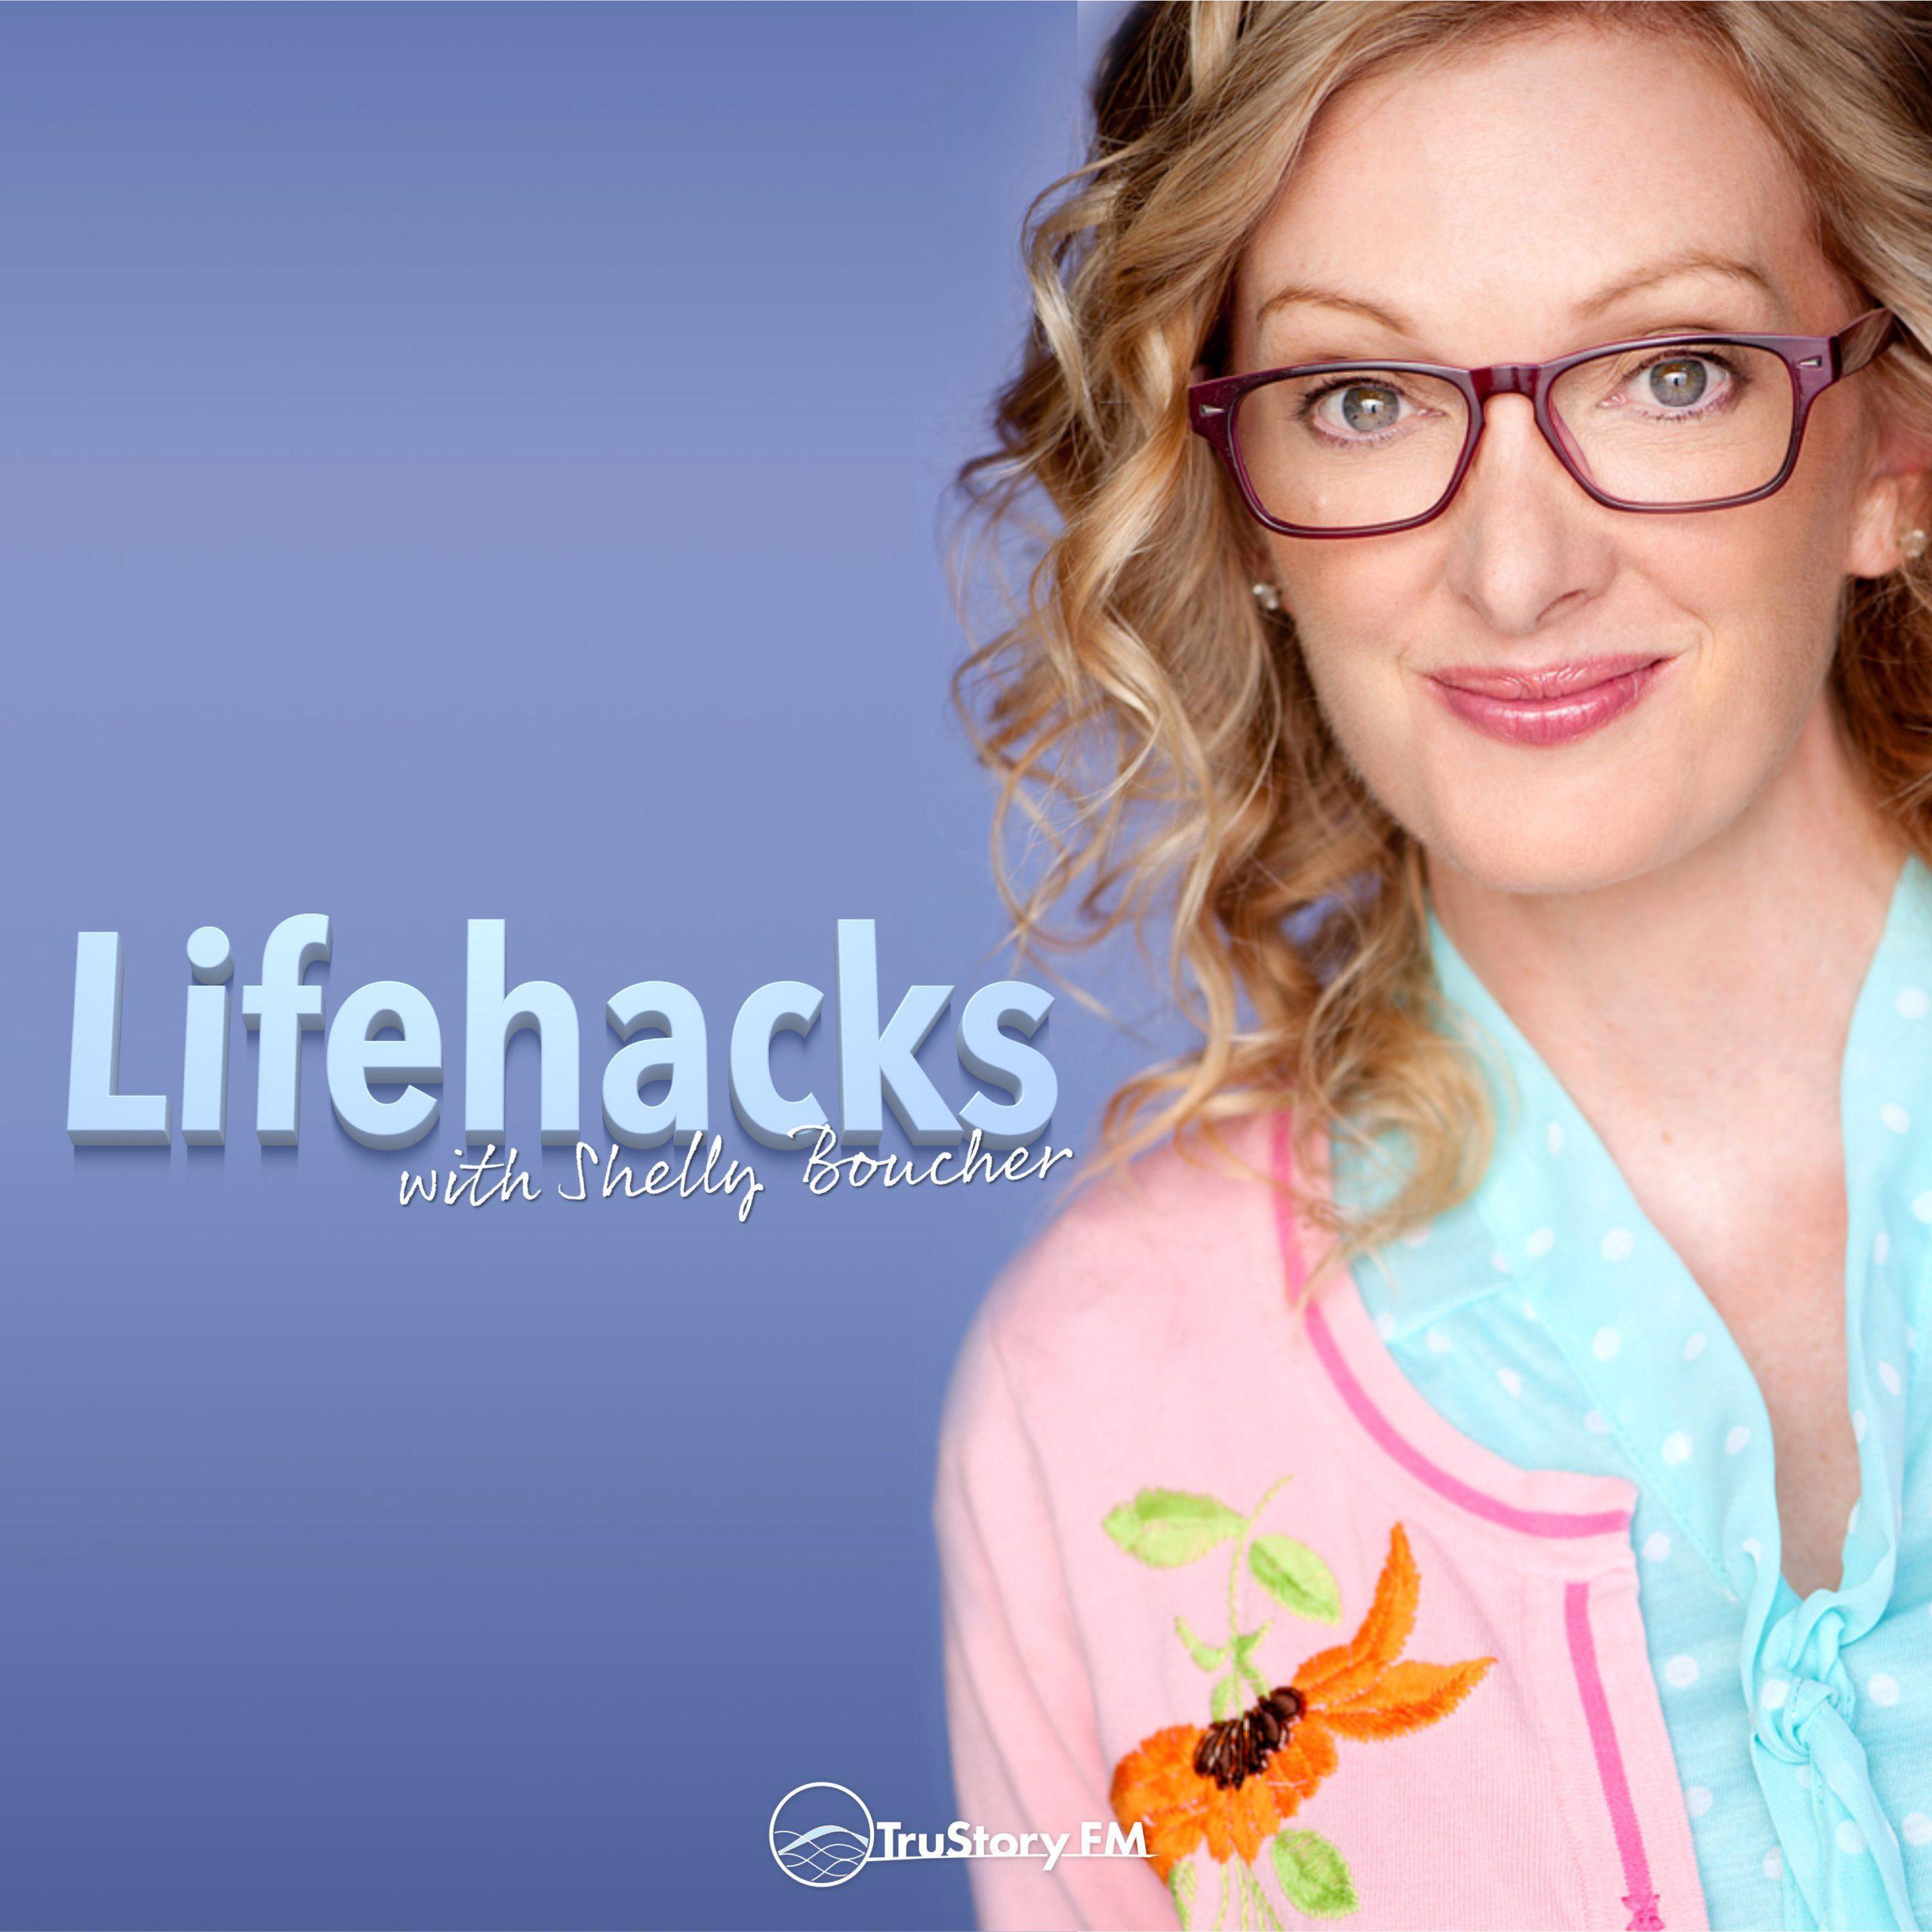 Lifehacks with Shelly Boucher